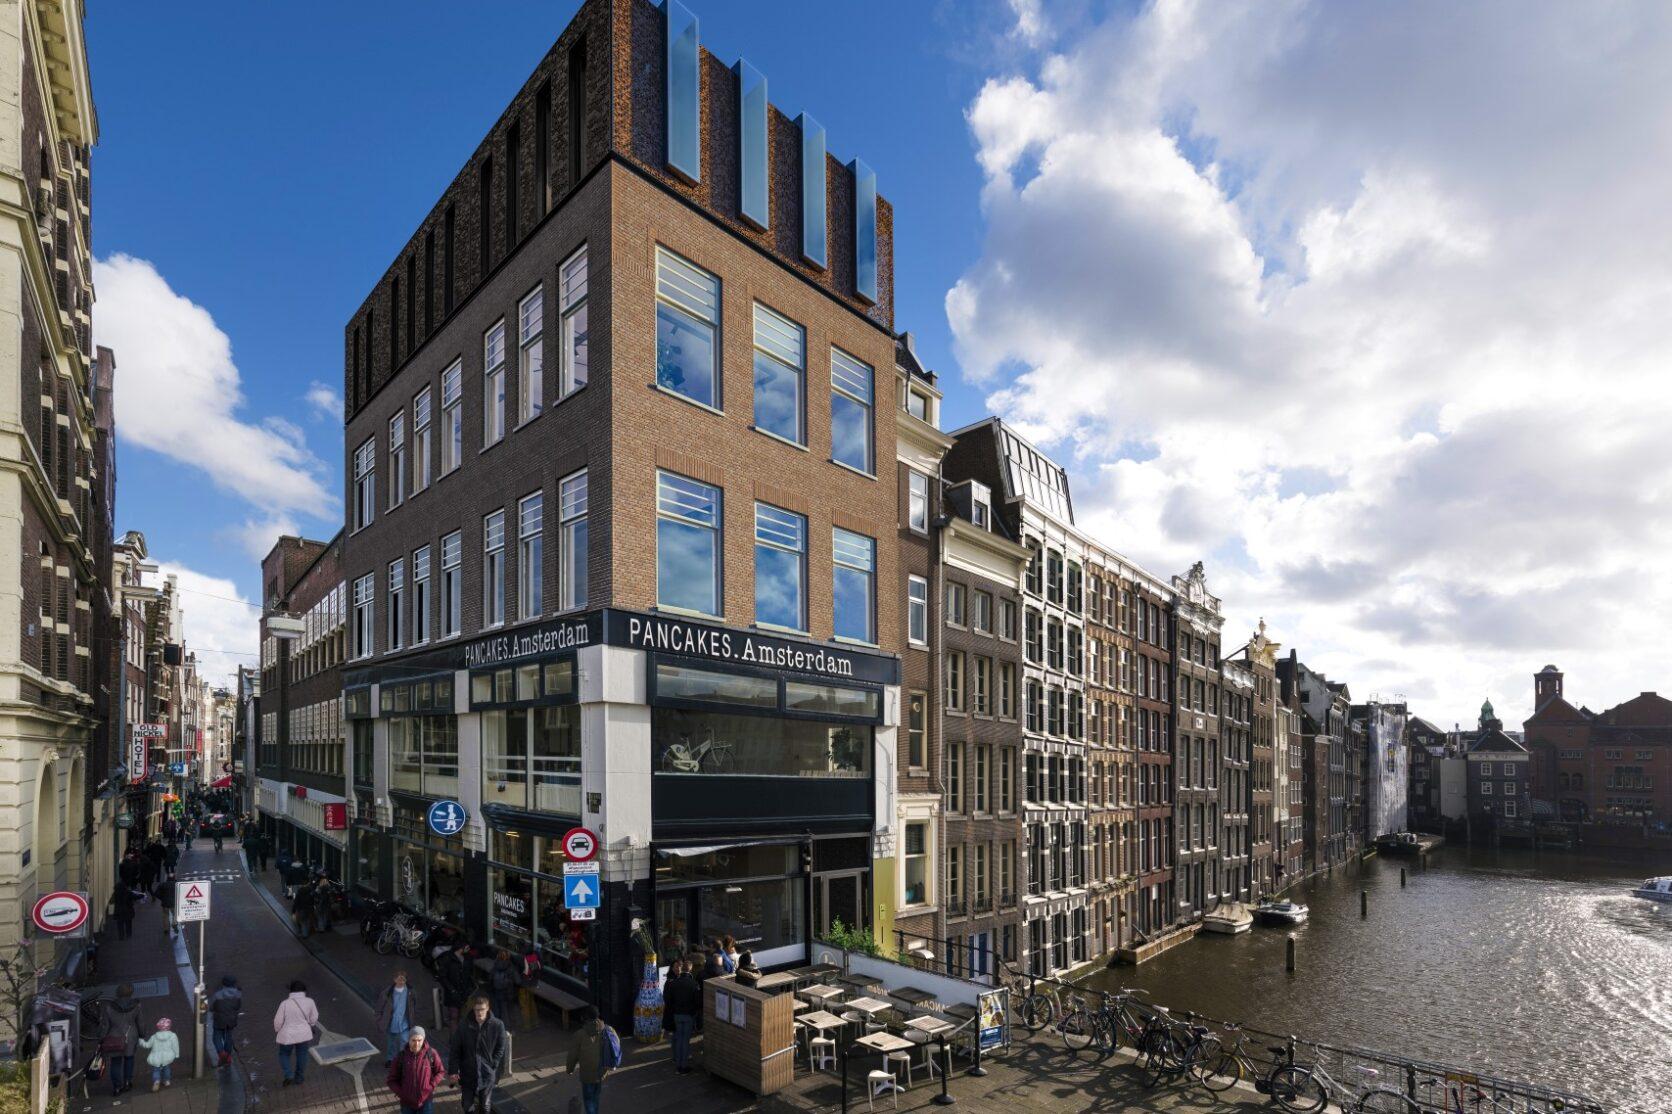 MD Formatura gevel Prins Hendrinkkade Amsterdam